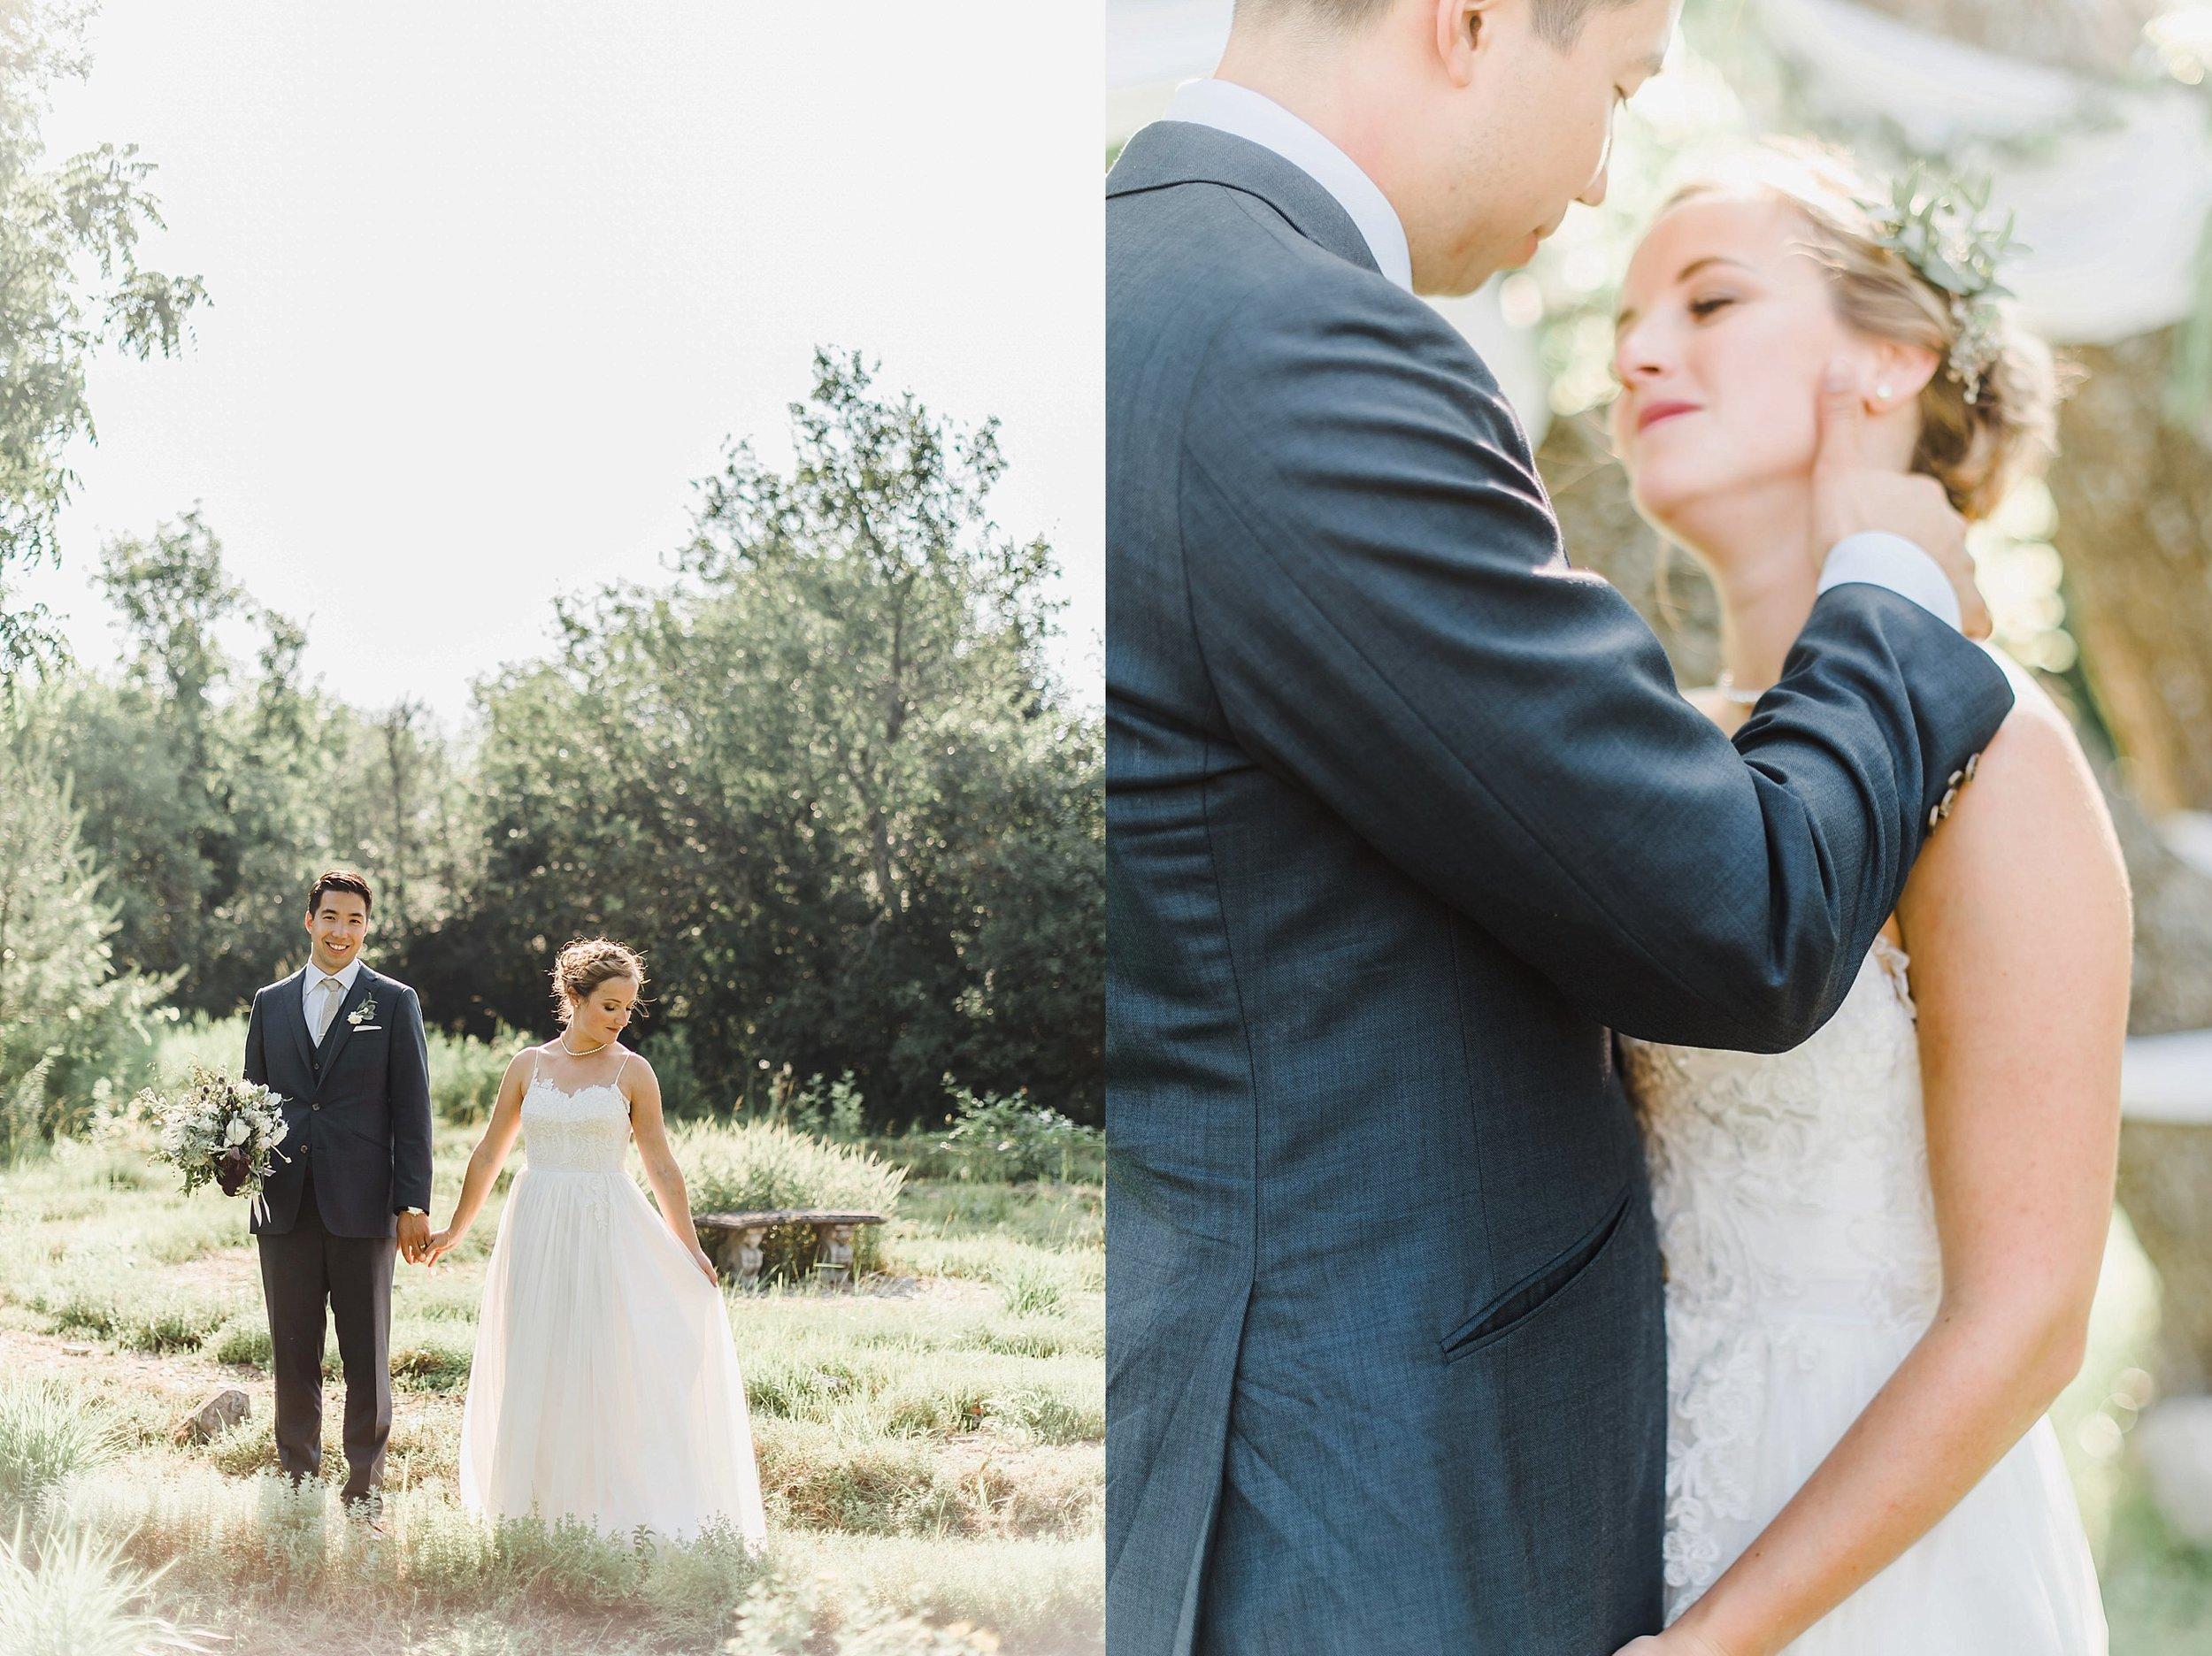 light airy indie fine art ottawa wedding photographer | Ali and Batoul Photography_0847.jpg